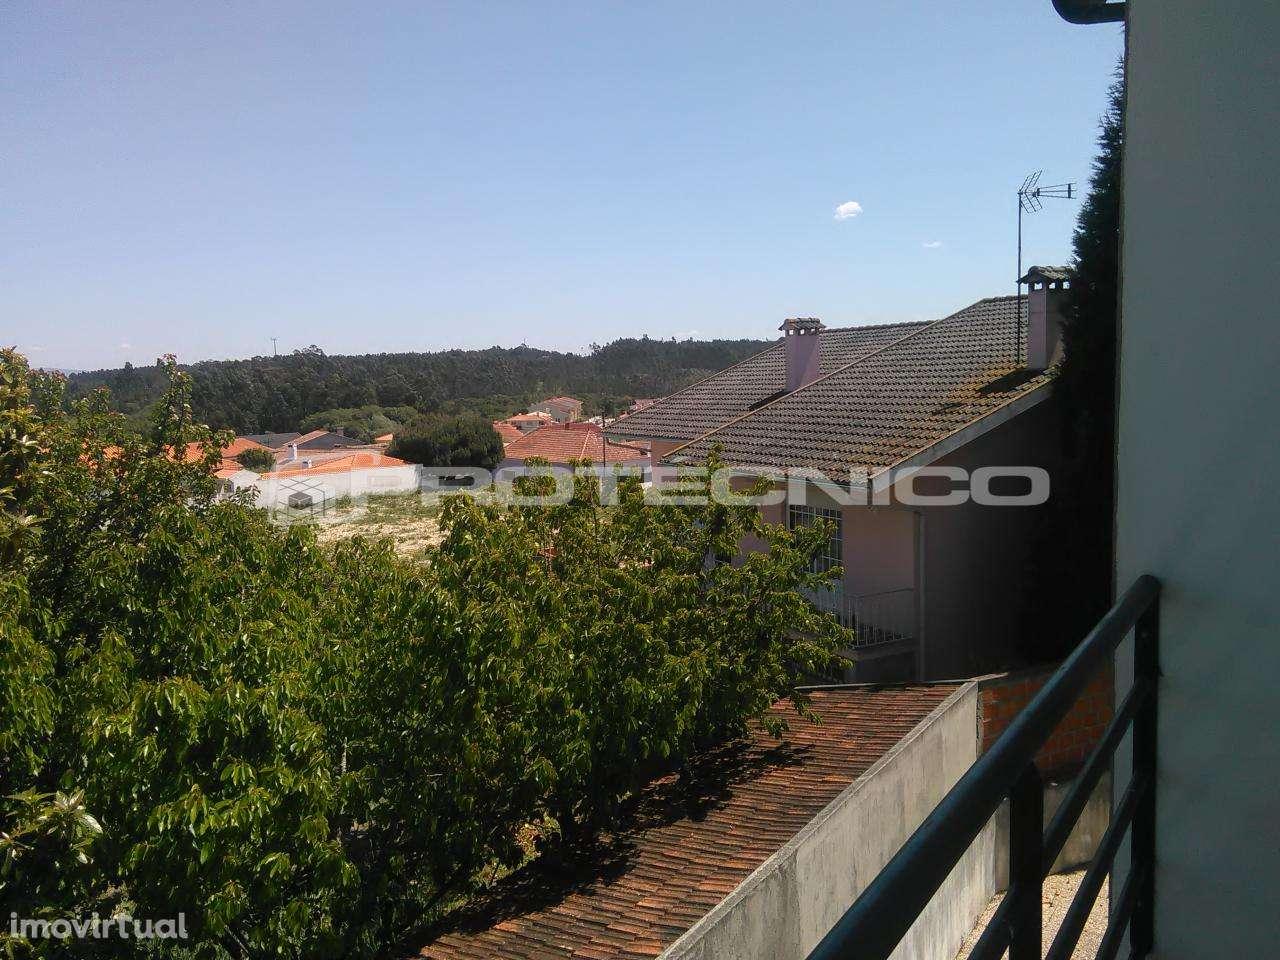 Moradia para comprar, Eixo e Eirol, Aveiro - Foto 15